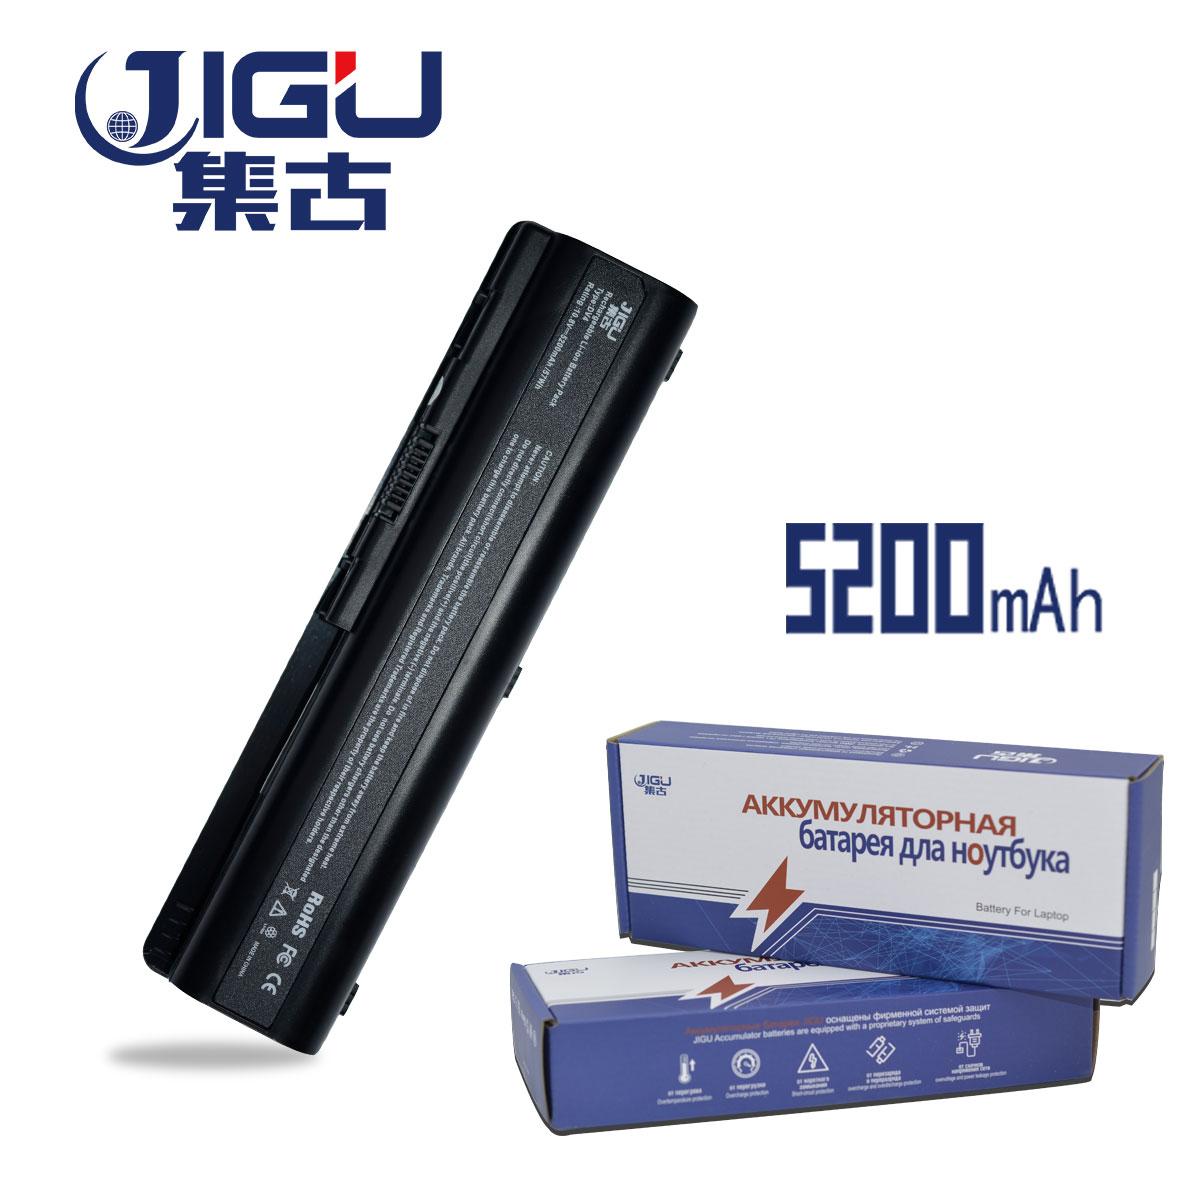 JIGU Laptop Battery For Hp 511872-001 HSTNN-LB73 462889-442 7FD034 HSTNN-LB72 HSTNN-UB72 484170-001 484170-002 484171-001 iecwanx 100% new laptop battery fmvnbp225 7 2v 36wh 5000mah for fujitsu stylistic q572 w7d 001 q572 w8 001 q572 g q572